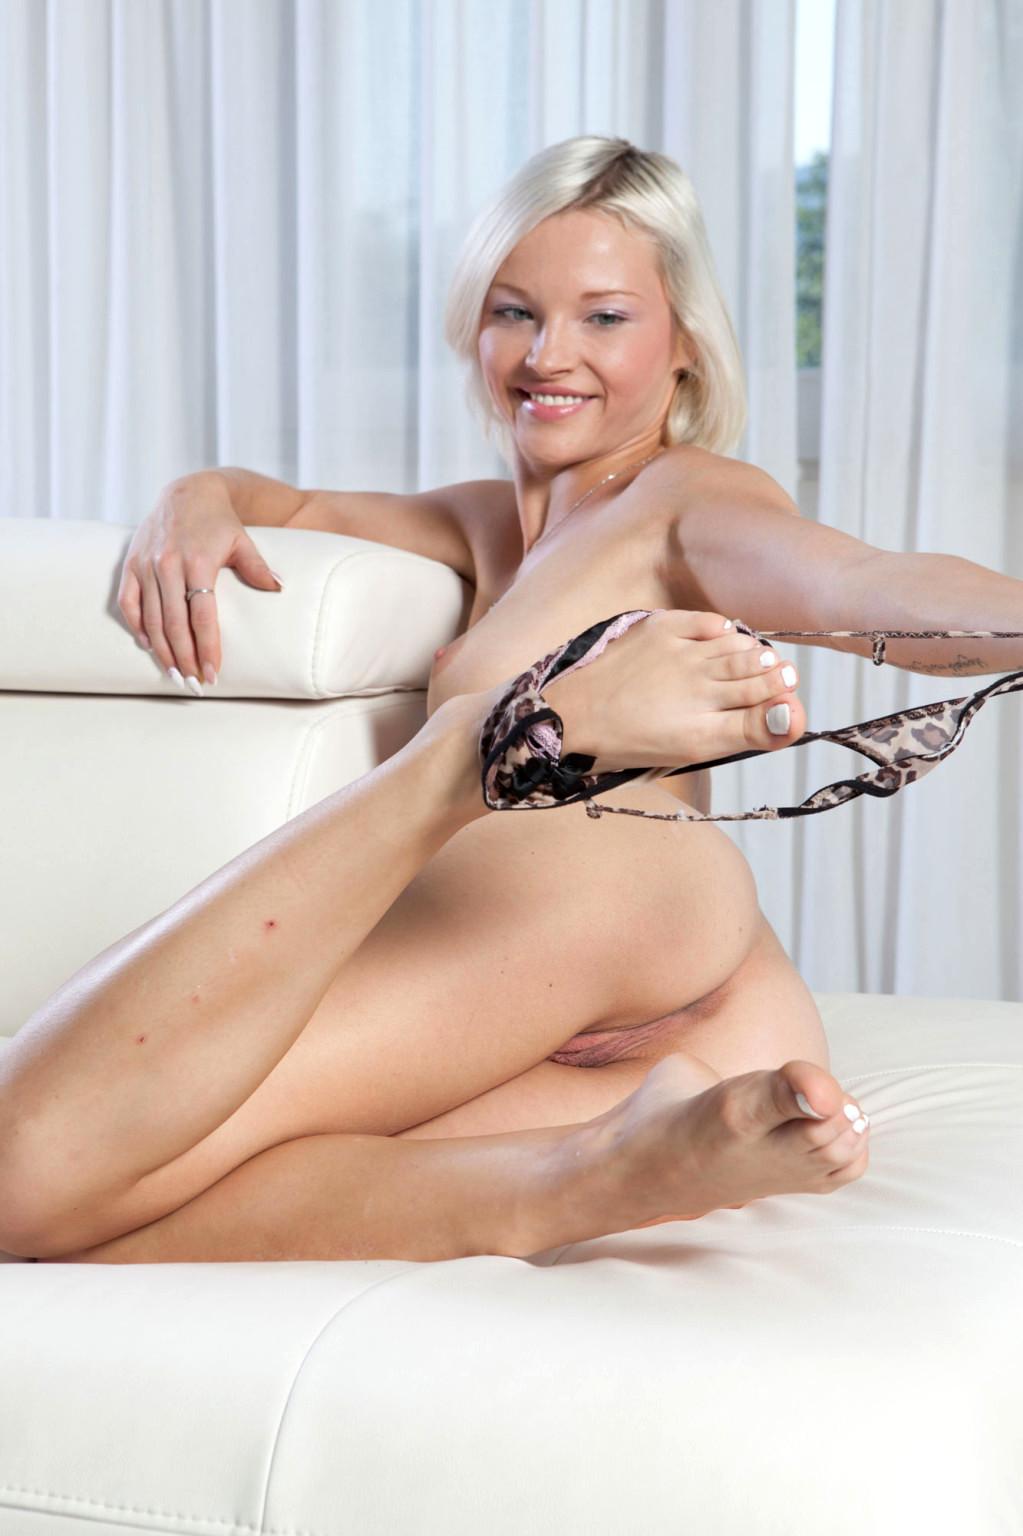 Babe Today Denudeart Zazie Skymm More Lingerie Porno Mobi -5574